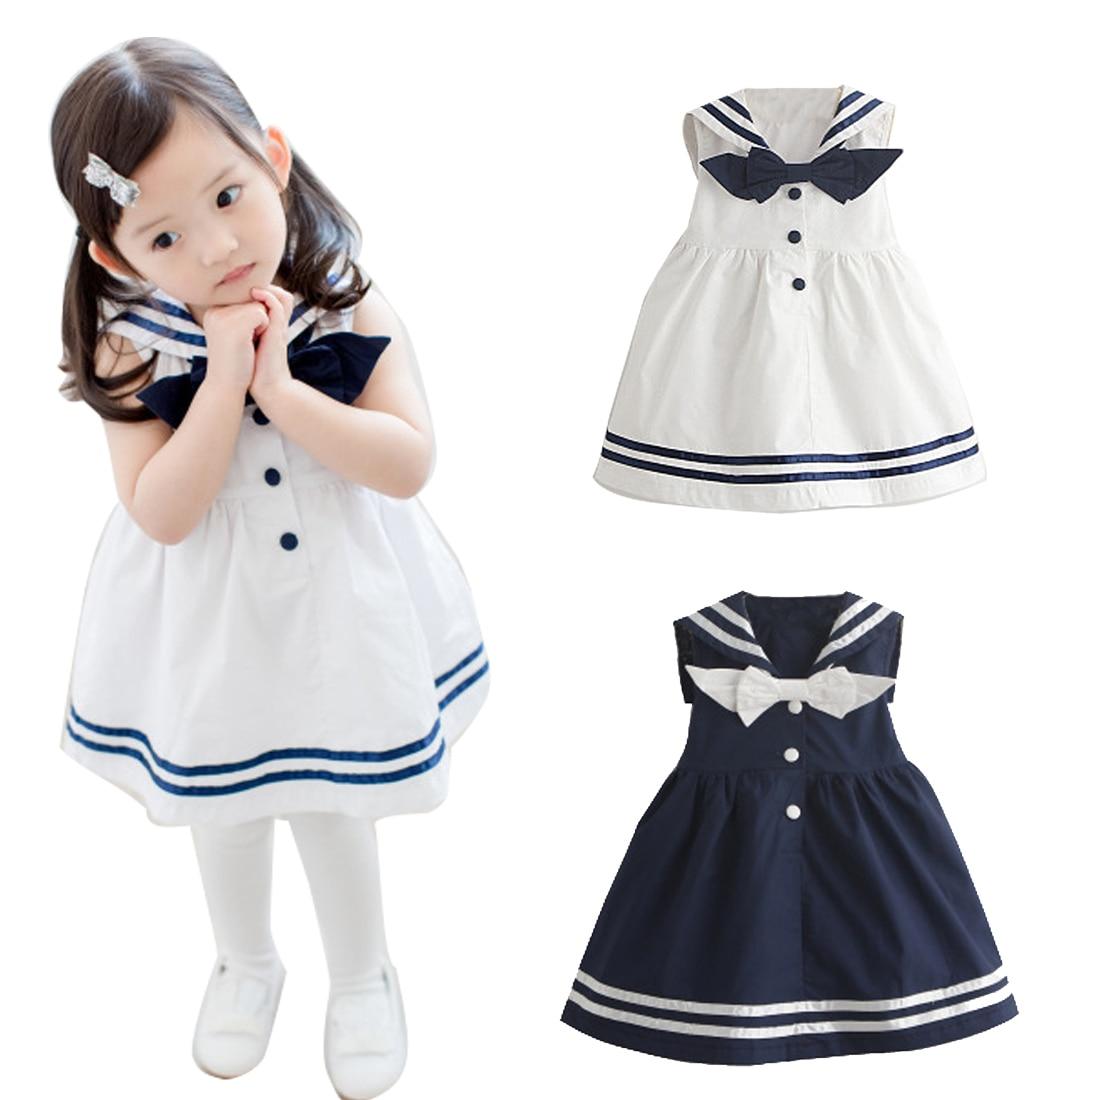 Gaorui Girl sleeveless kid Dress Baby Princess 2018 New Navy Sailor Uniforms Casual Style Girls Dress For Age 3-8 Years